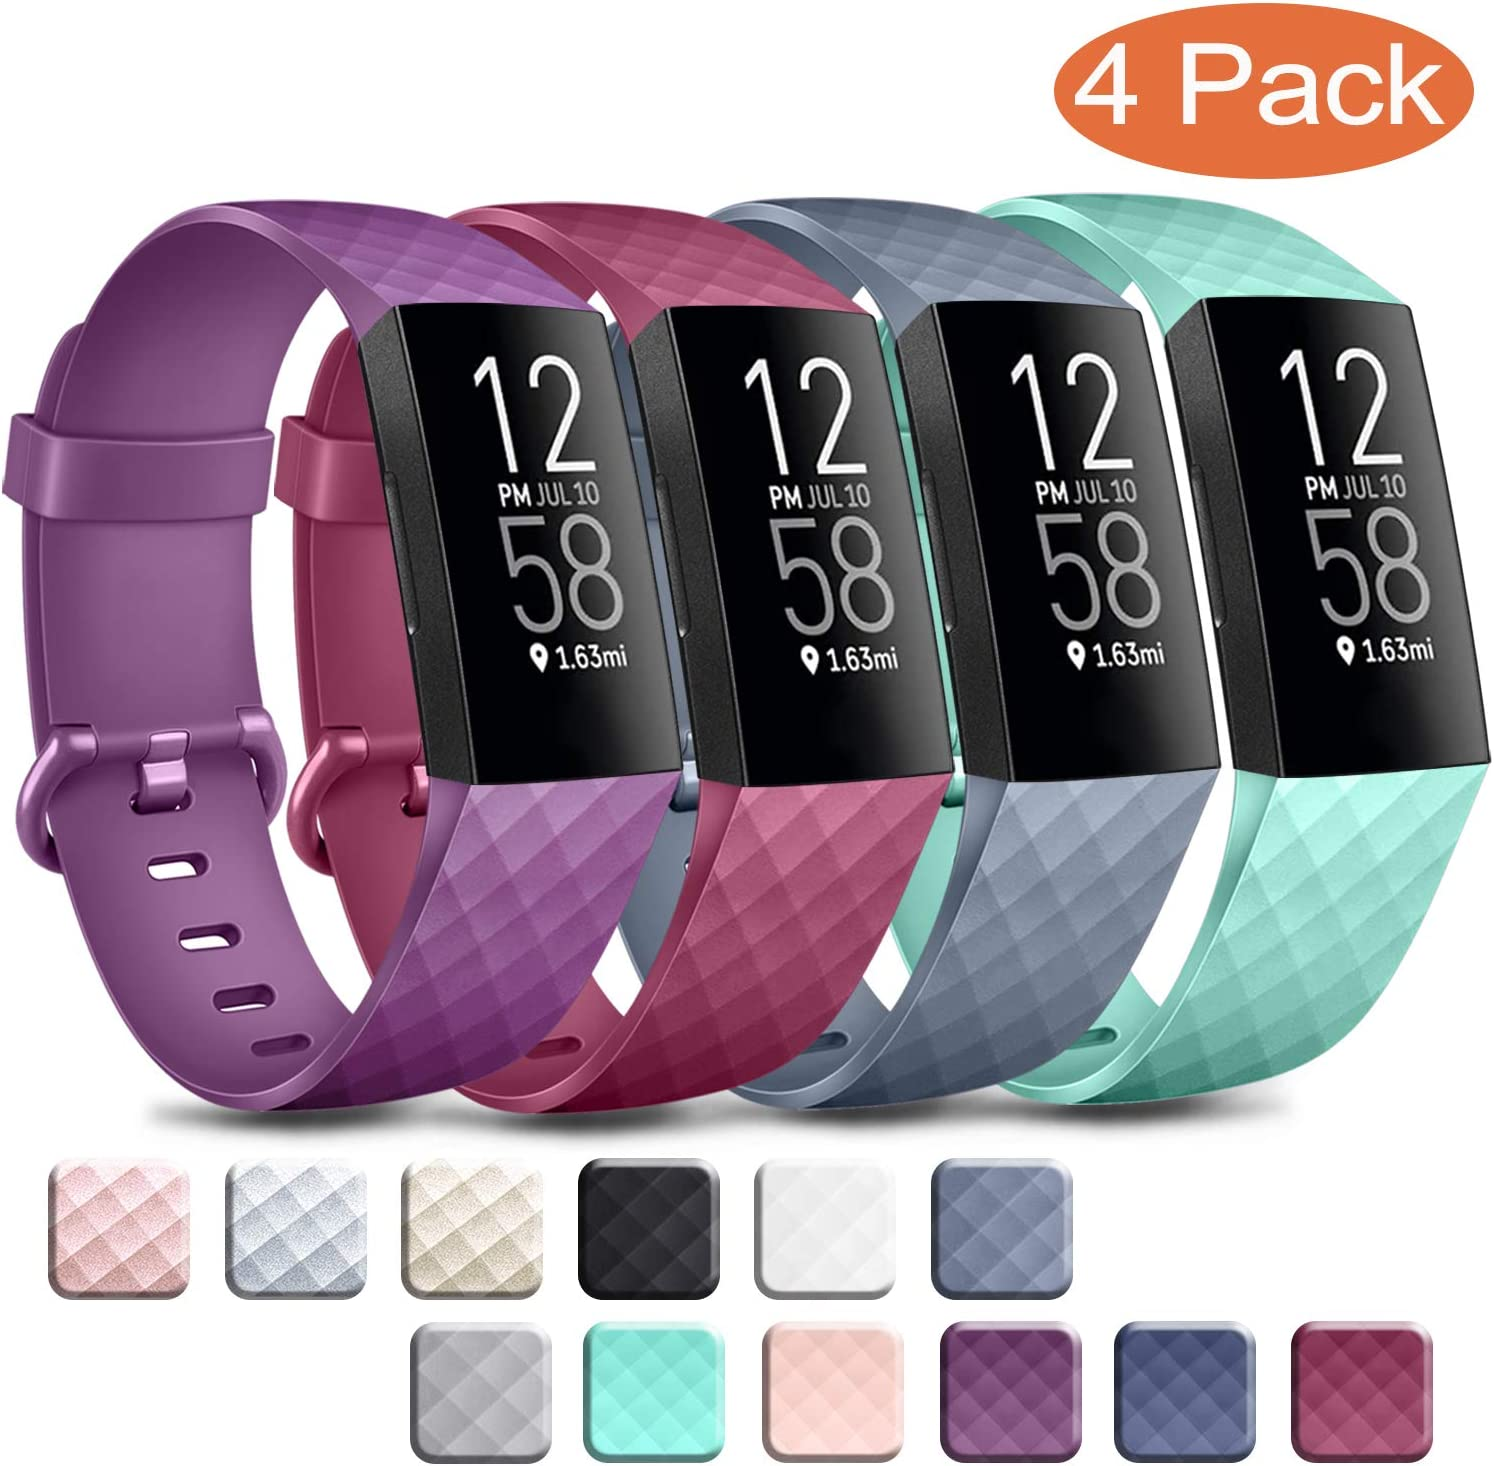 Wanme Pack 4 Kompatibel f/ür Charge 3 Armband Verstellbarer Sport Ersatzarmband Kompatibel mit Fitbit Charge 4 und Fitbit Charge 3 Fitbit Charge 4 Armband